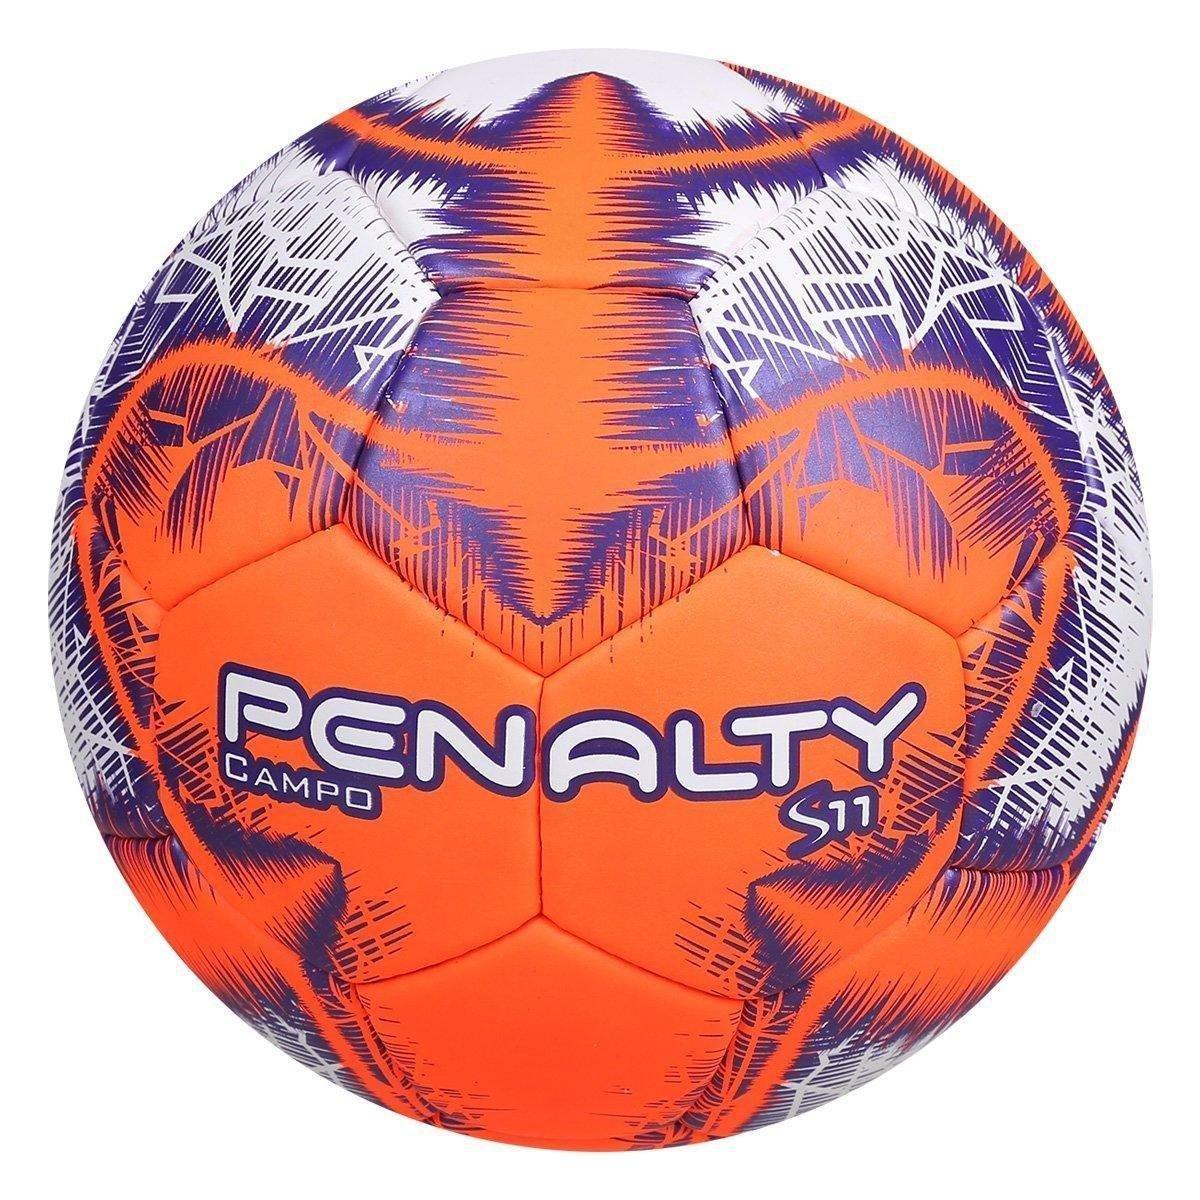 aab0f03806 Bola de Futebol Campo Penalty S11 R4 Ix - Branco e Laranja - Compre ...